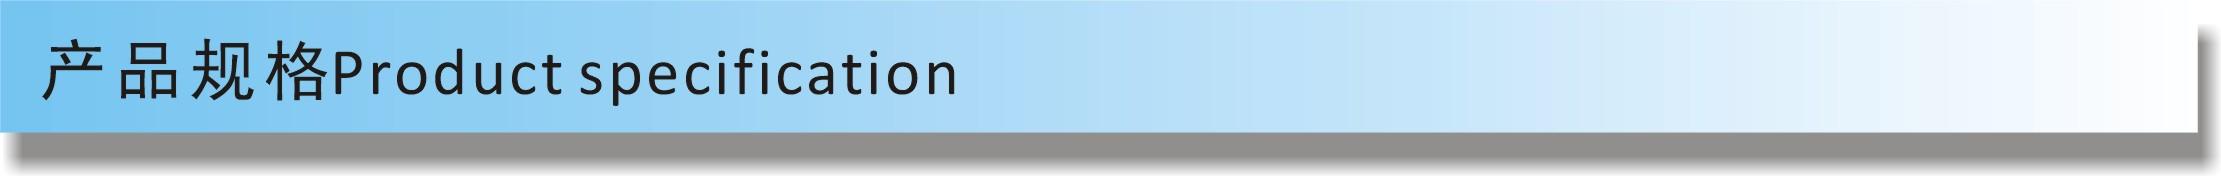 Back To Search Resultsautomobiles & Motorcycles Car Stickers Dynamic 1pc Car Styling Door Sill Guard Rear Bumper Protector Strip For Lada Kalina Granta Priora Niva Largus Samara Vesta Accessories